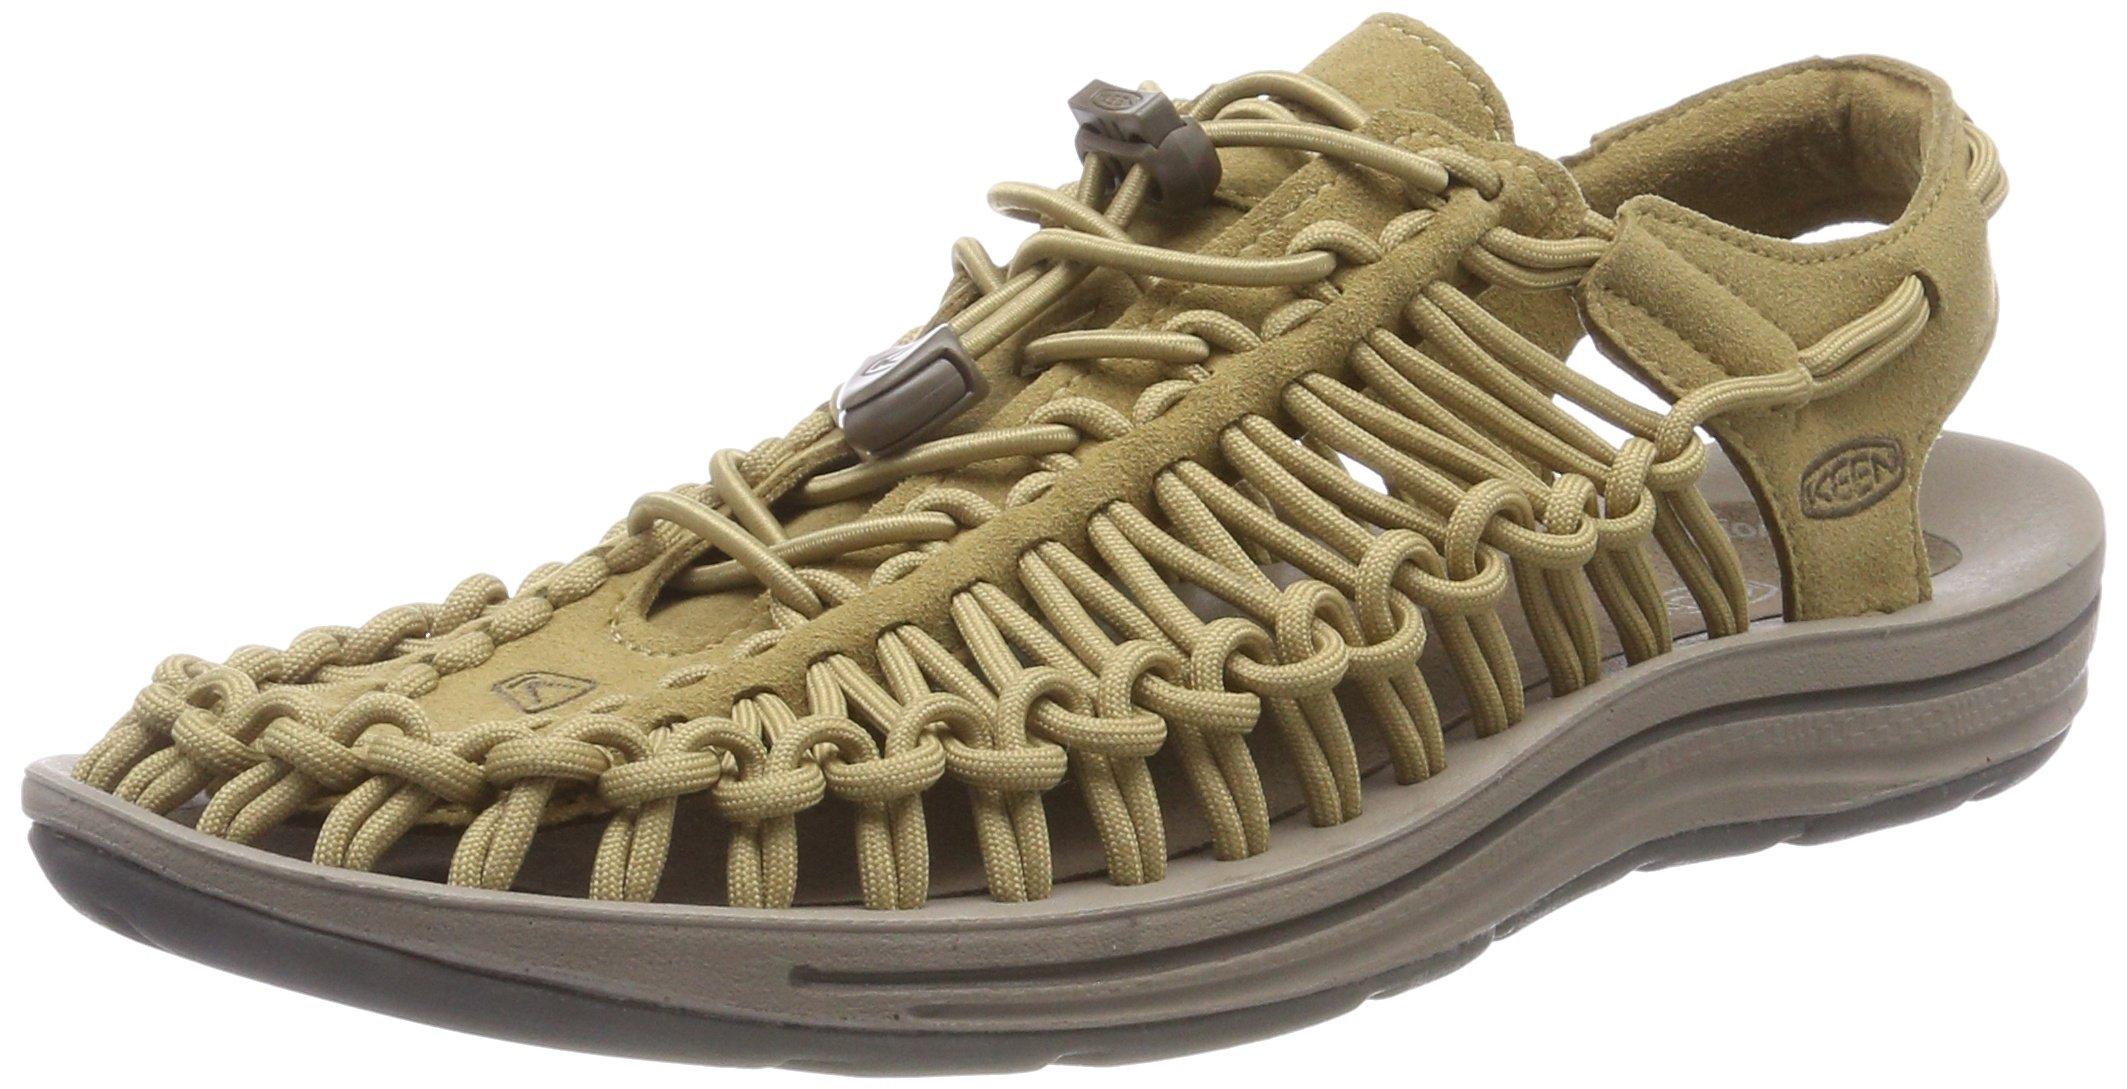 Keen Men's Uneek-M Sandal, Antique Bronze/Canteen, 12 M US